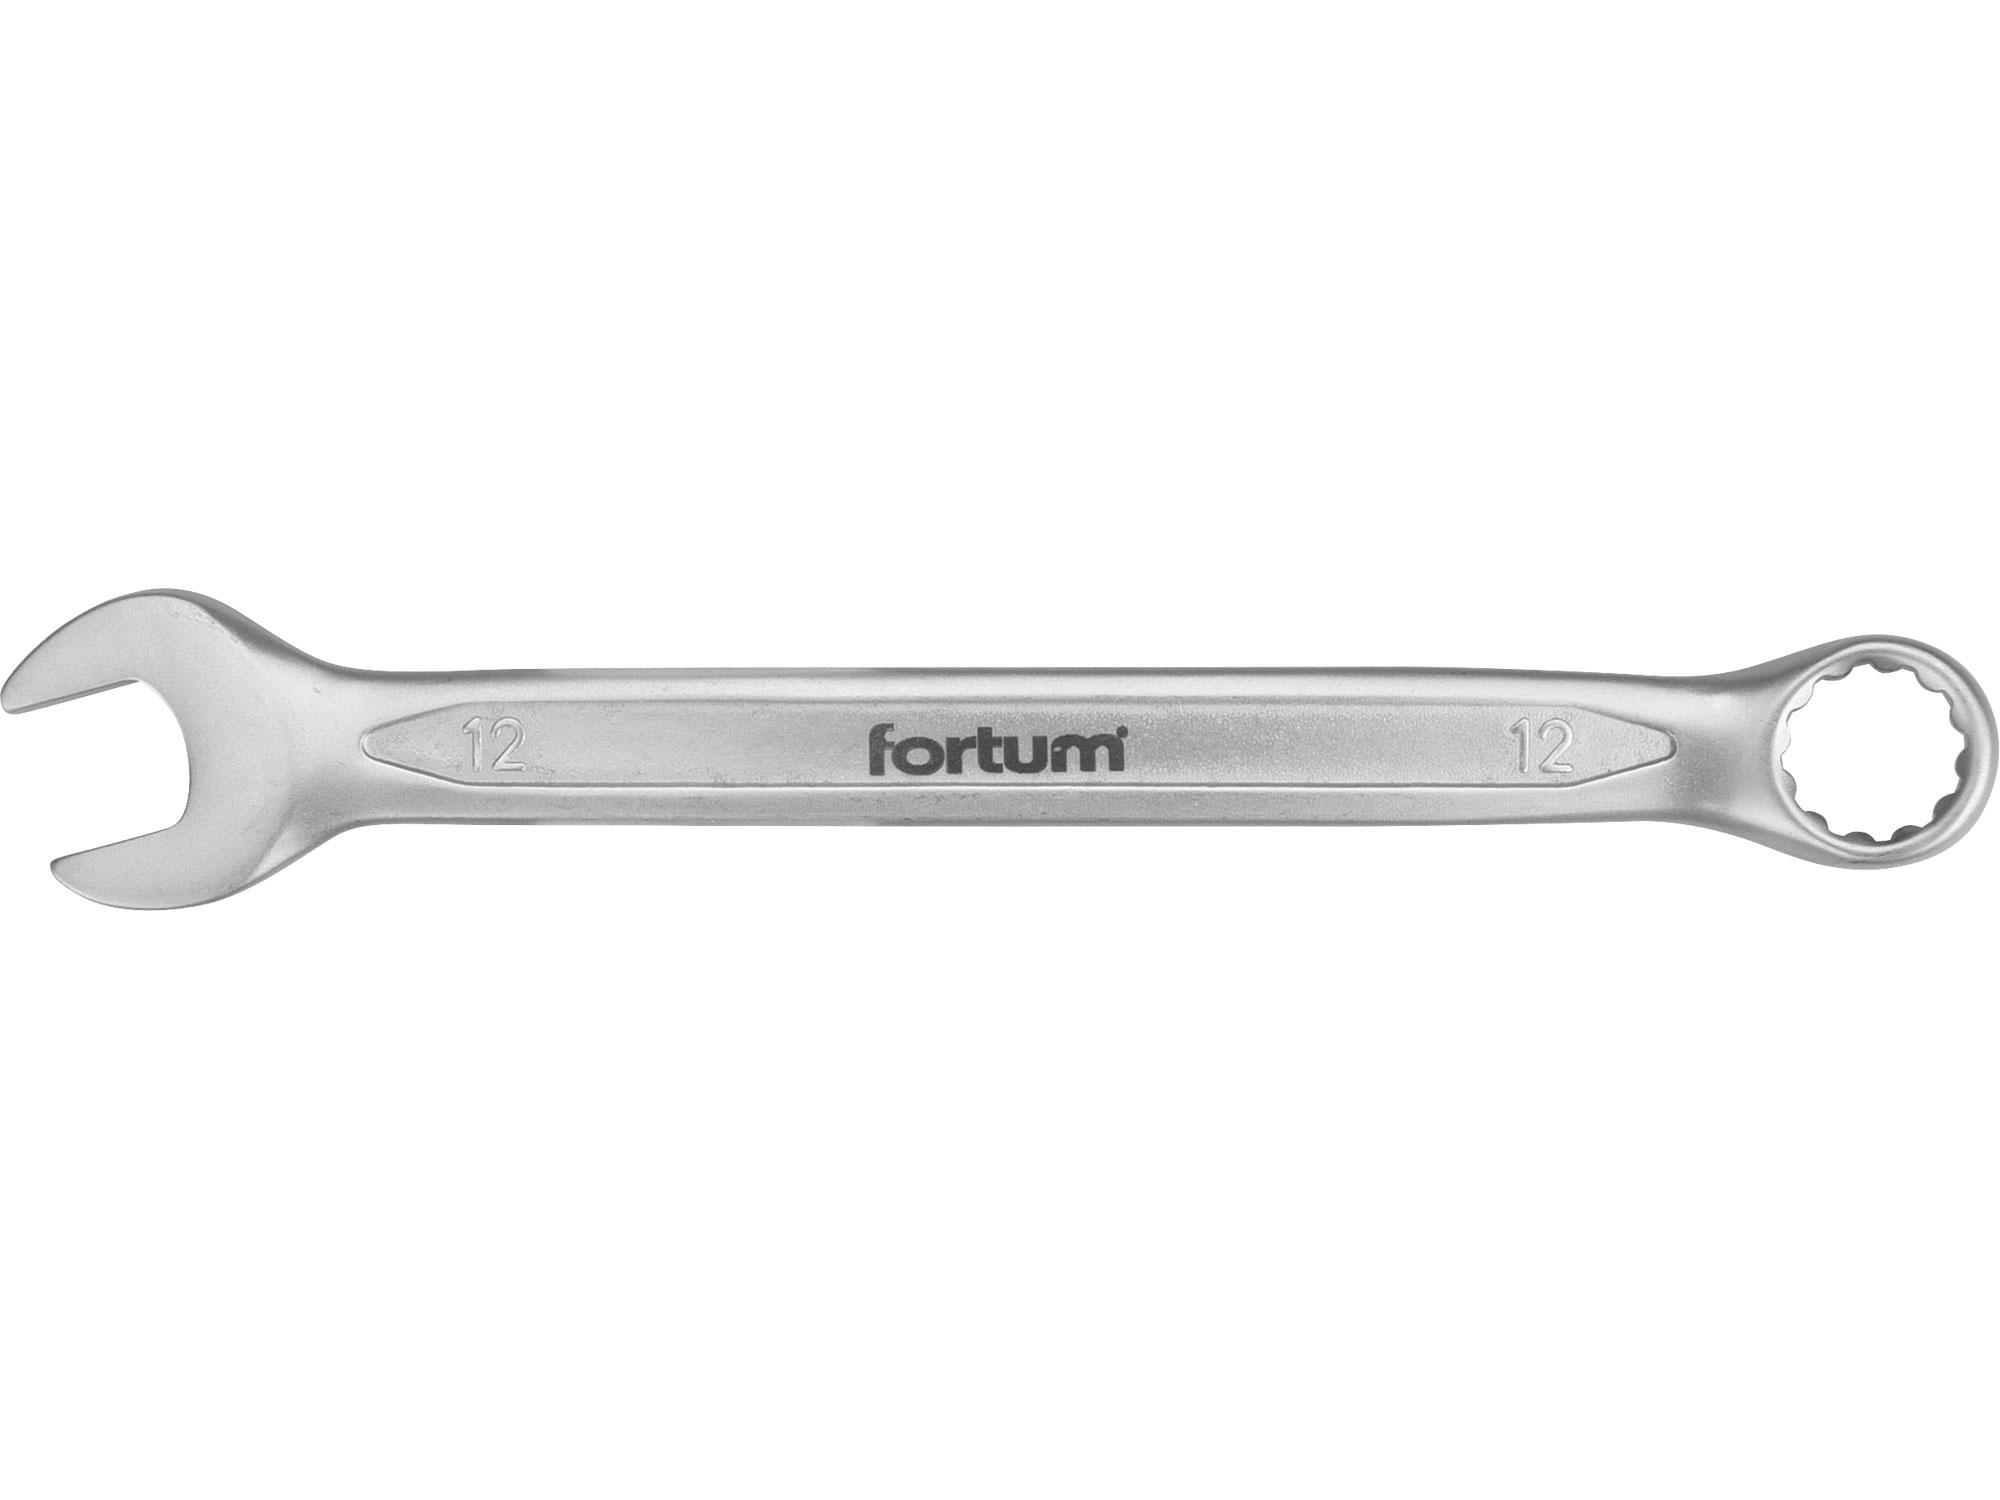 klíč očkoplochý, 12mm, L 171mm, FORTUM 4730212